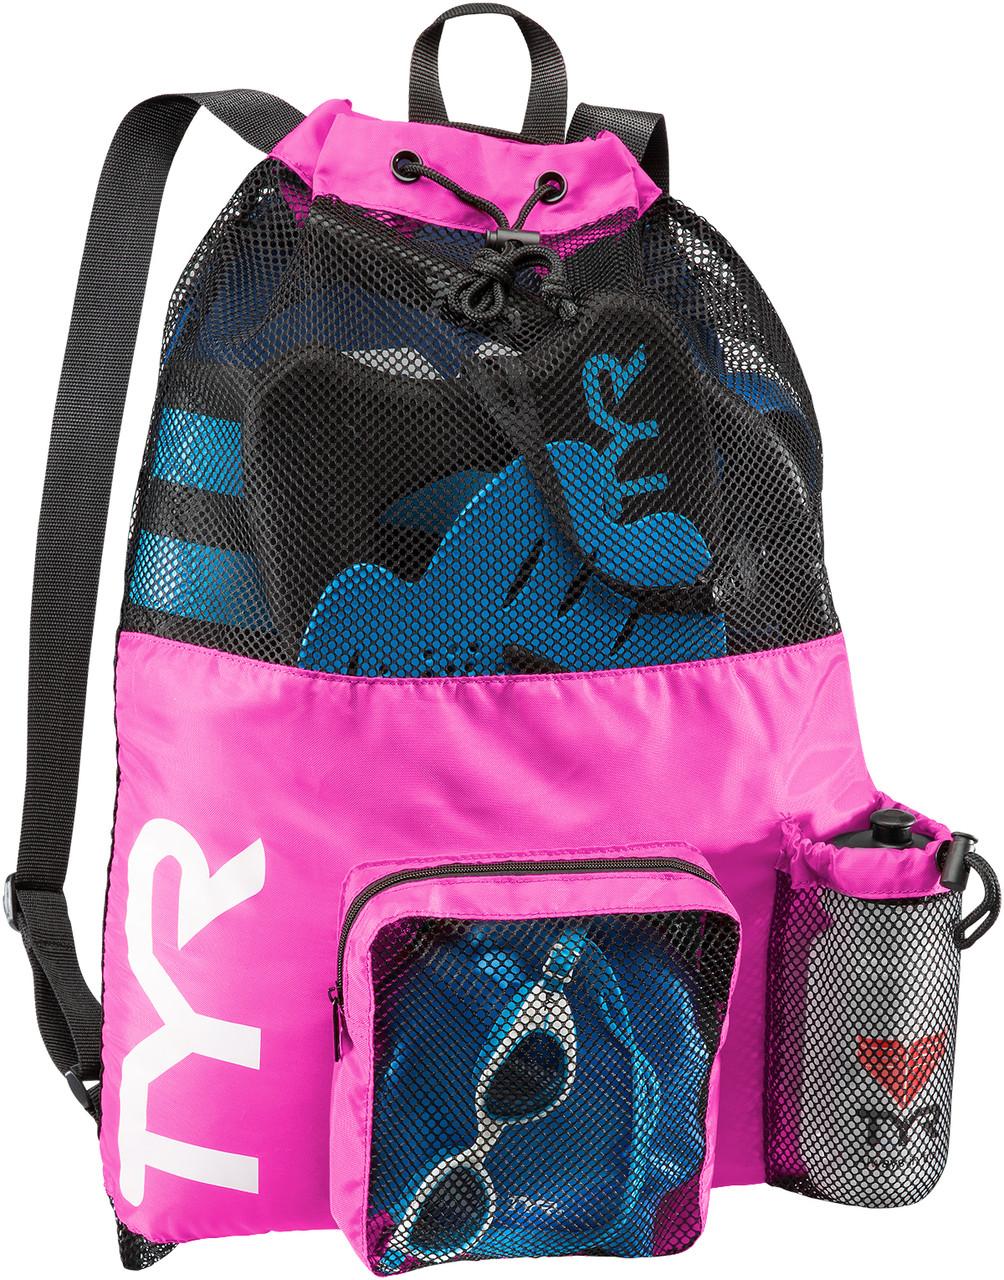 Рюкзак для аксессуаров TYR Big Mesh Mummy Backpack 670